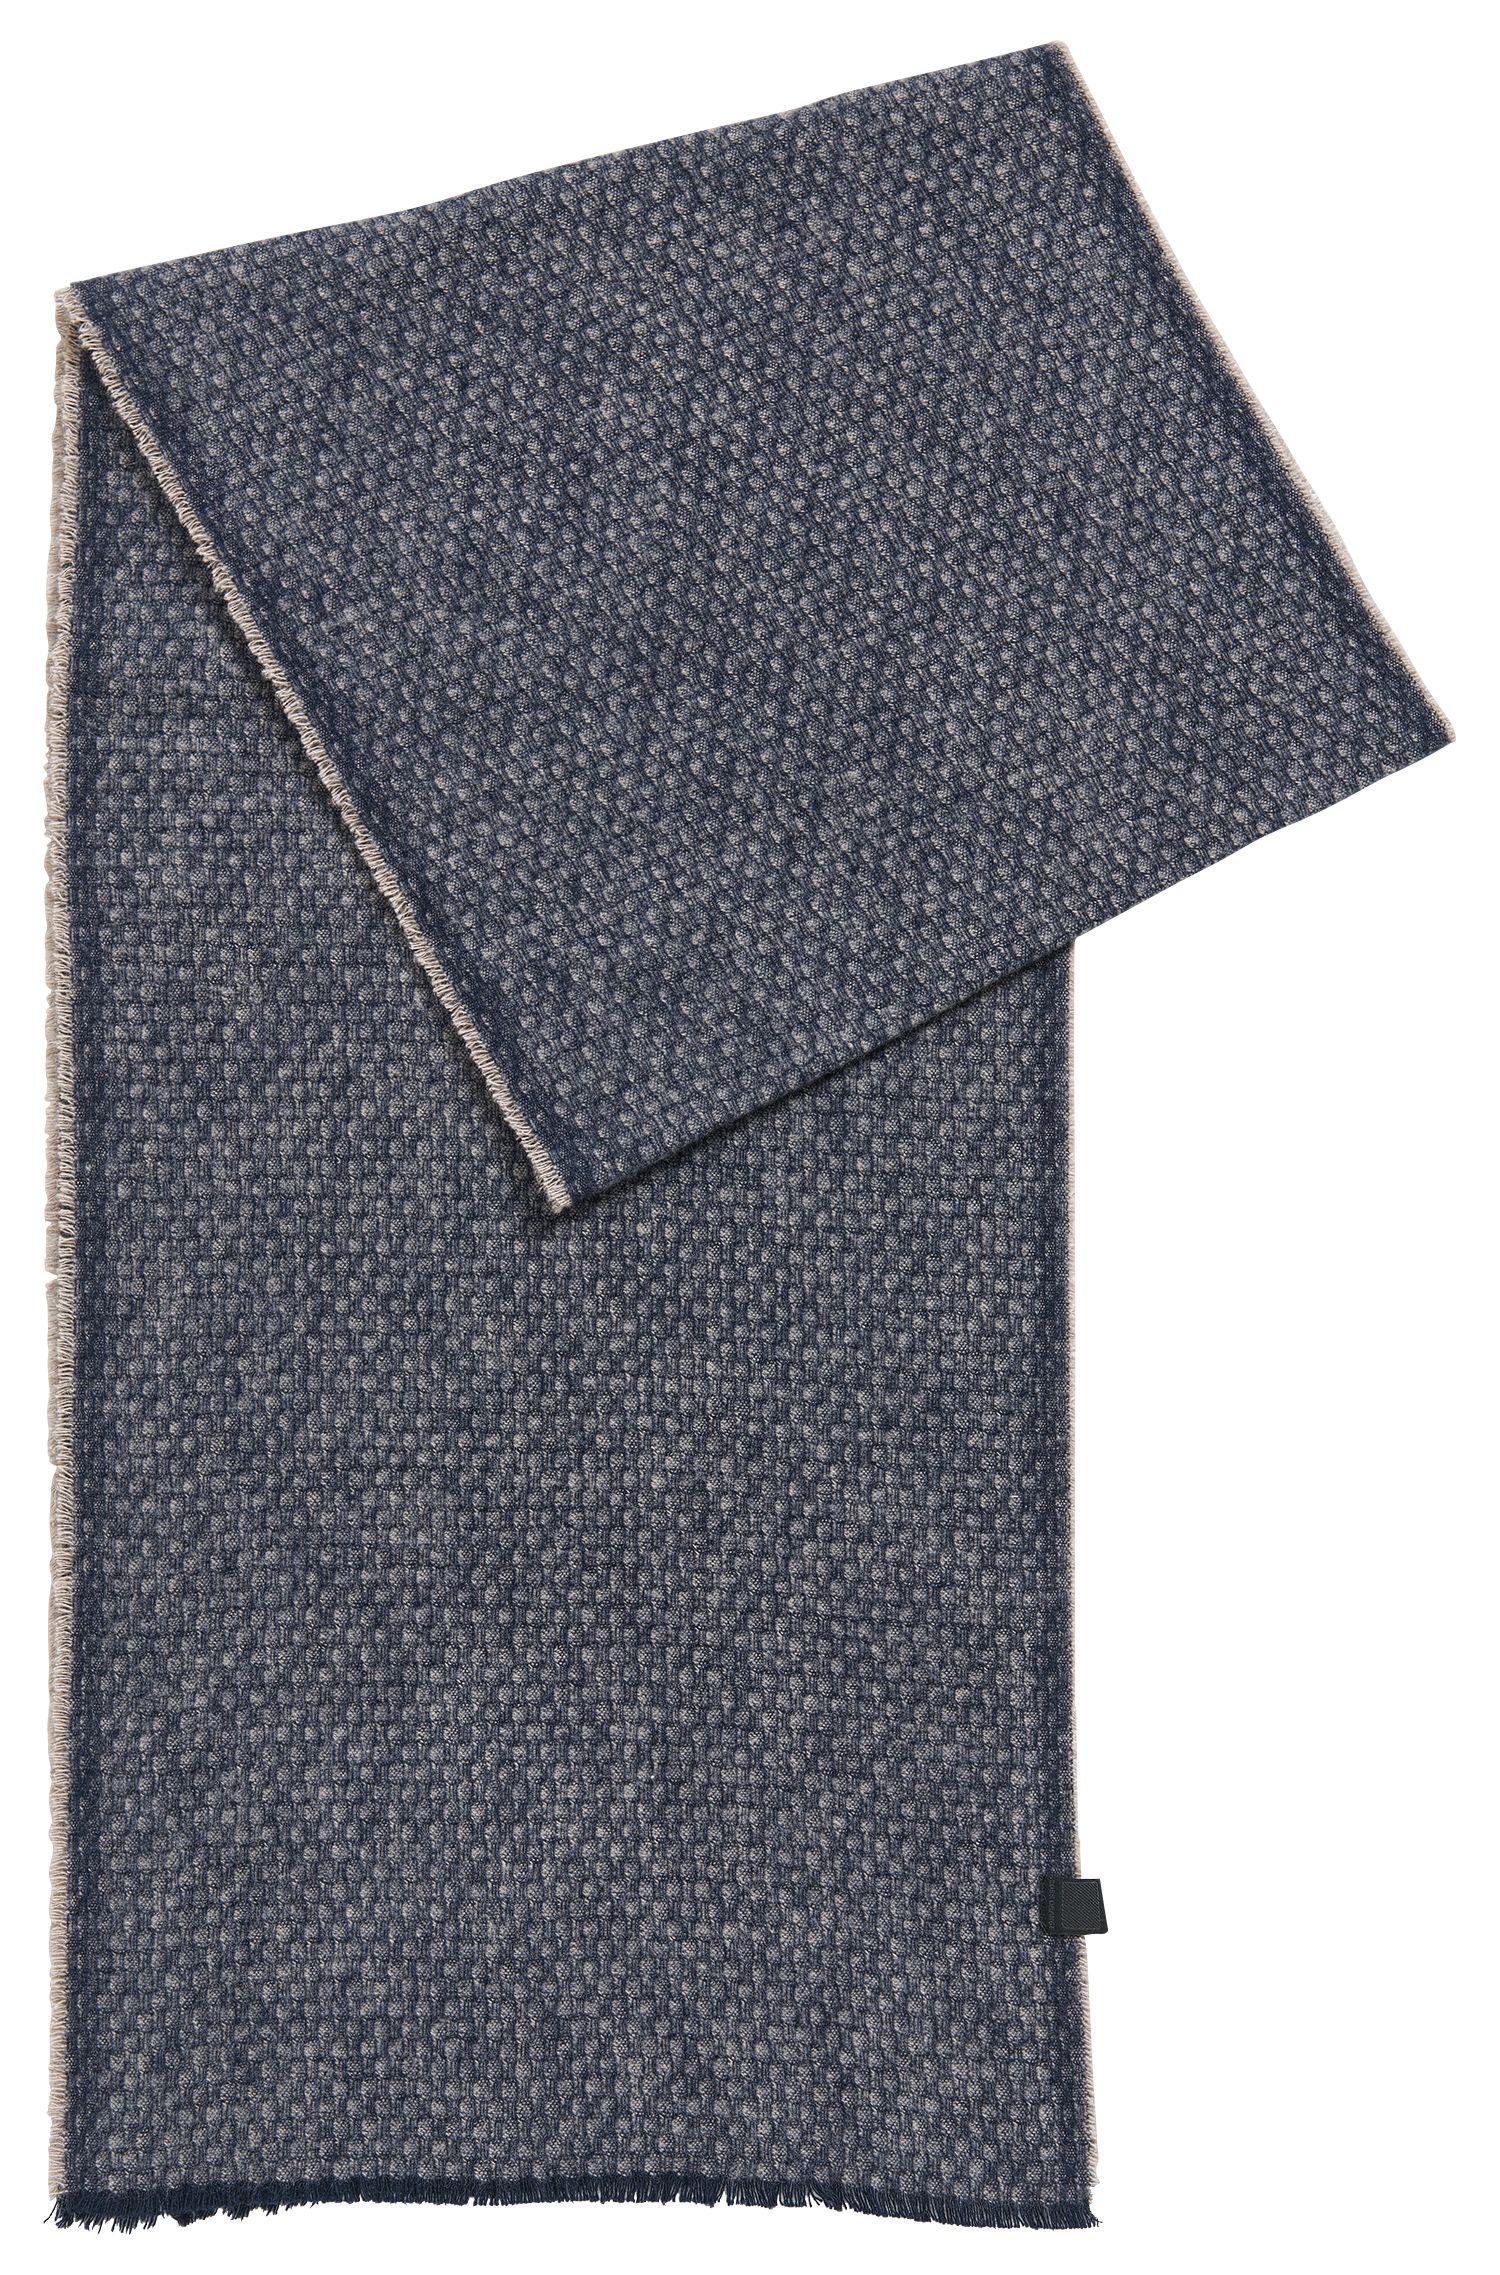 Bufanda con flecos discretos en algodón con textura